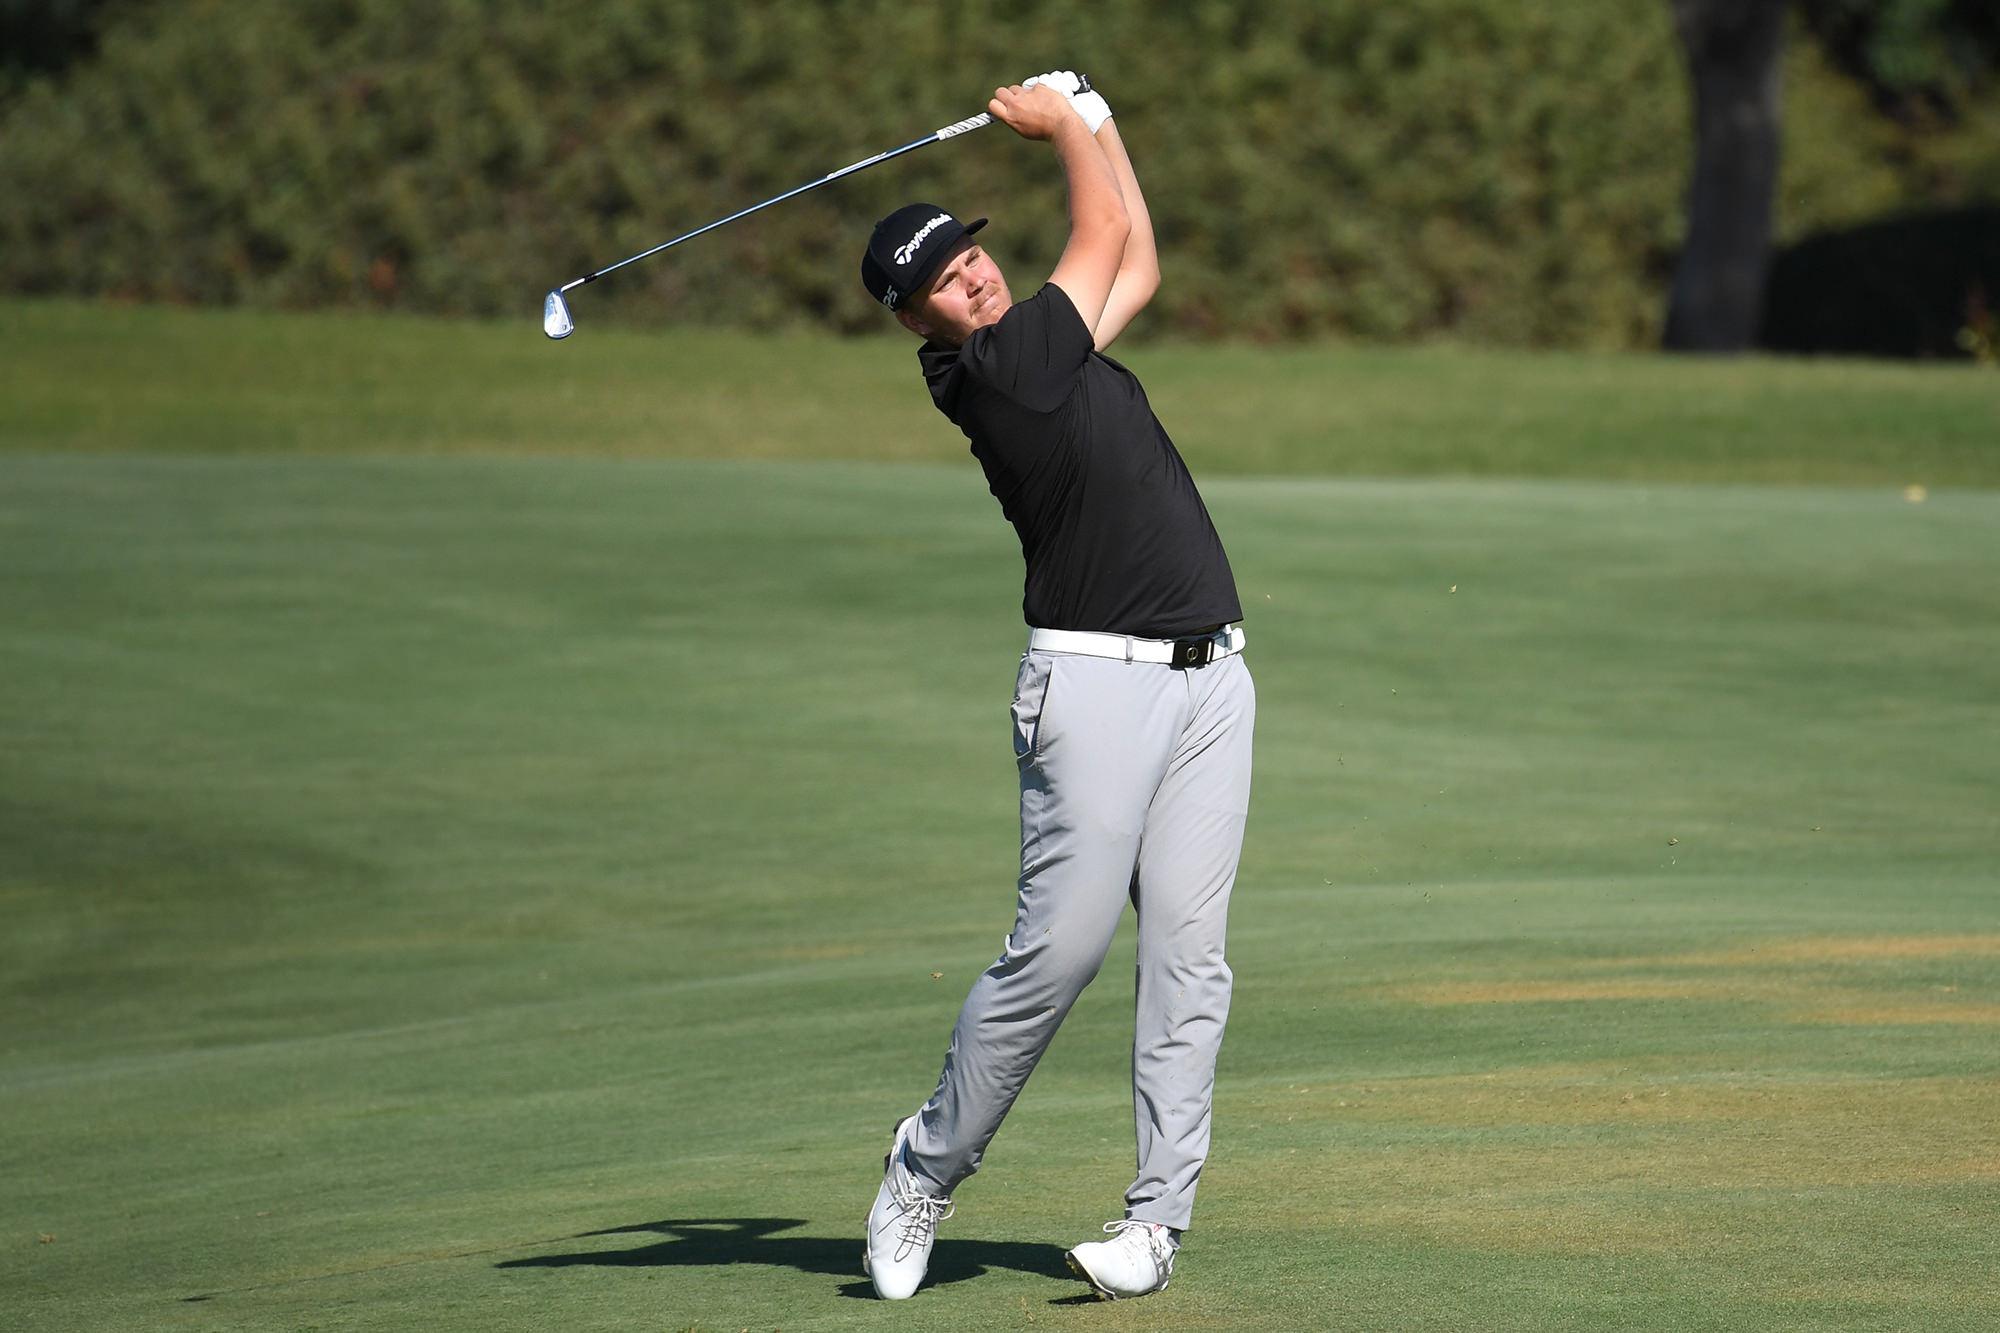 SV | National Club Golfer